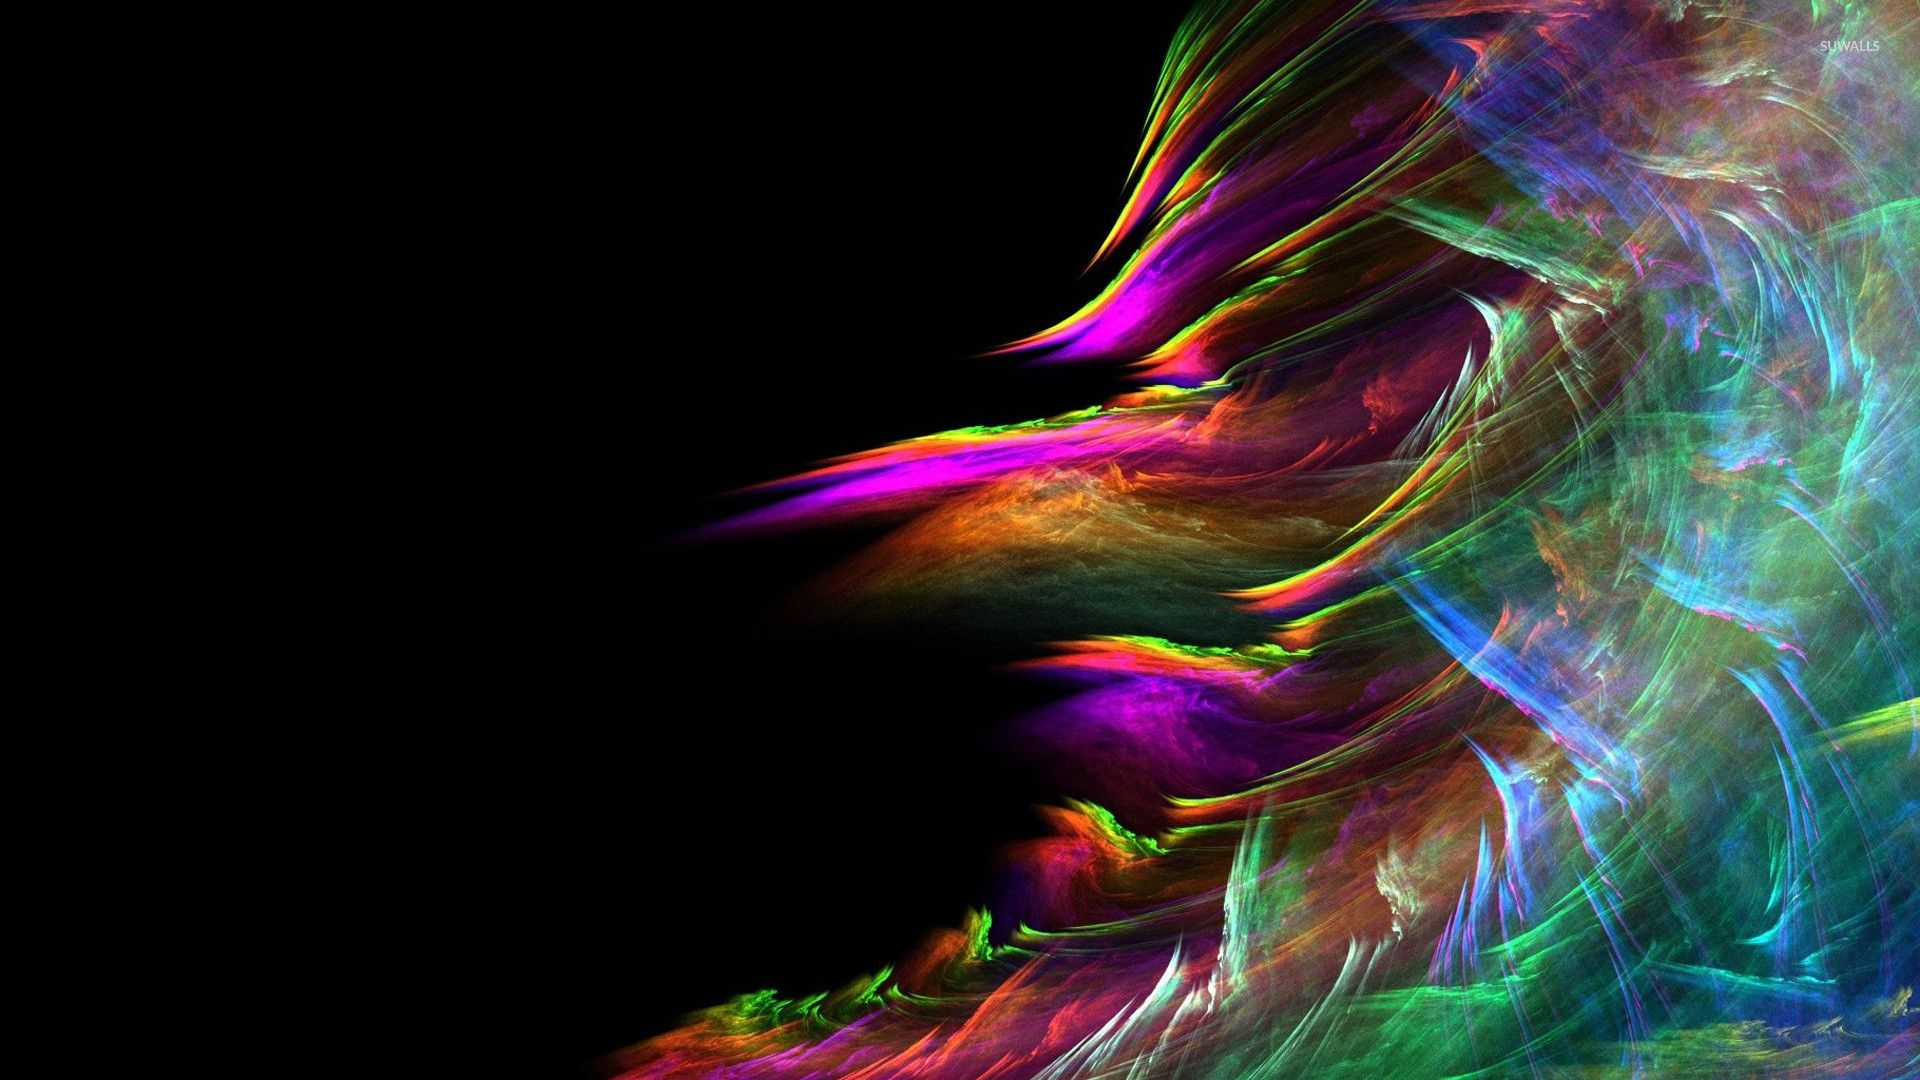 Color Splash Wallpapers Top Free Color Splash Backgrounds Wallpaperaccess